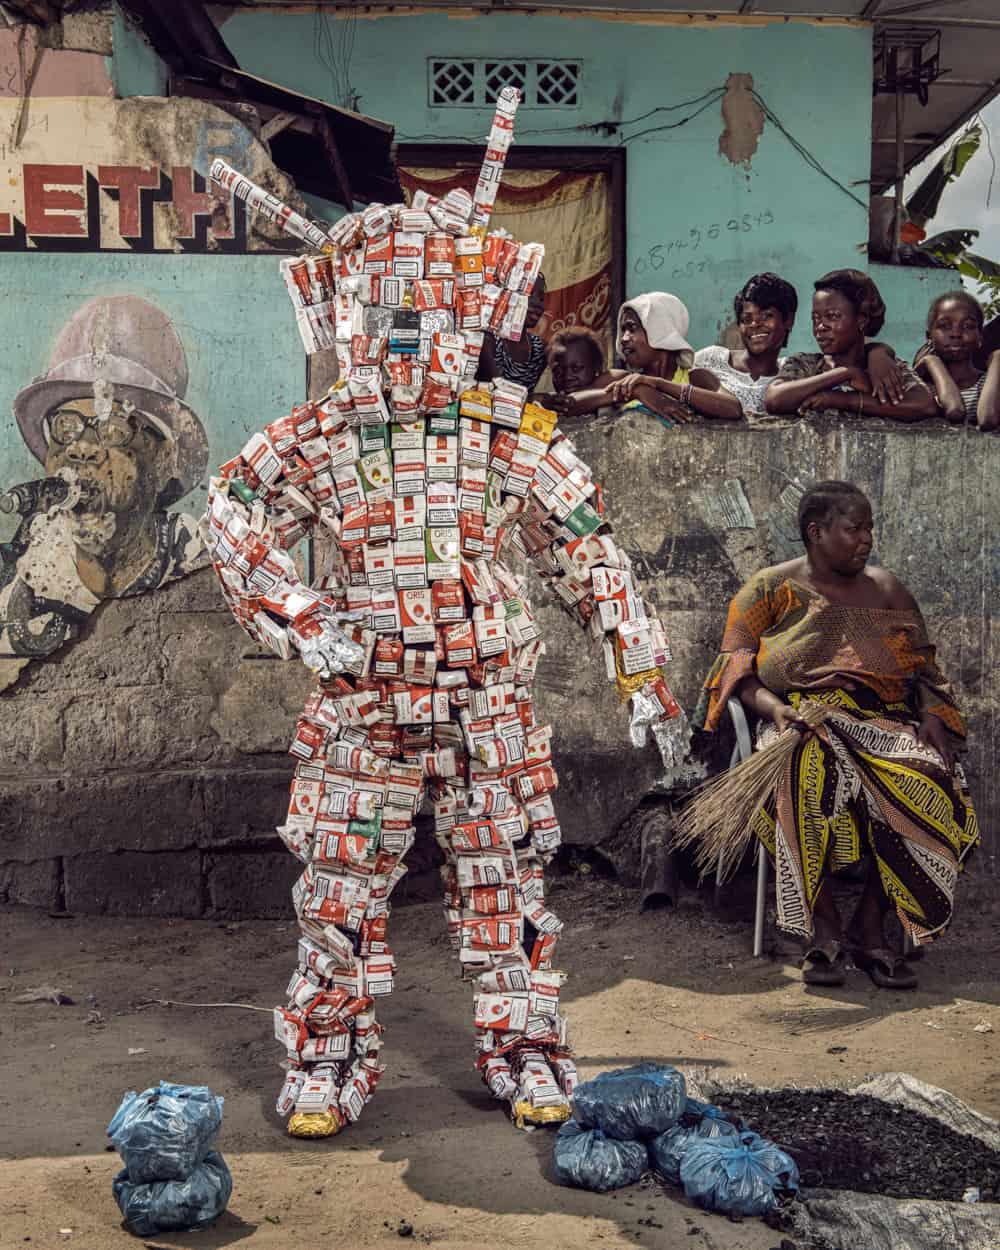 Untitled #10, 2020 Homo Detritus, Real Portraitik #5 Kinshasa, RDC ©Stephan Gladieu